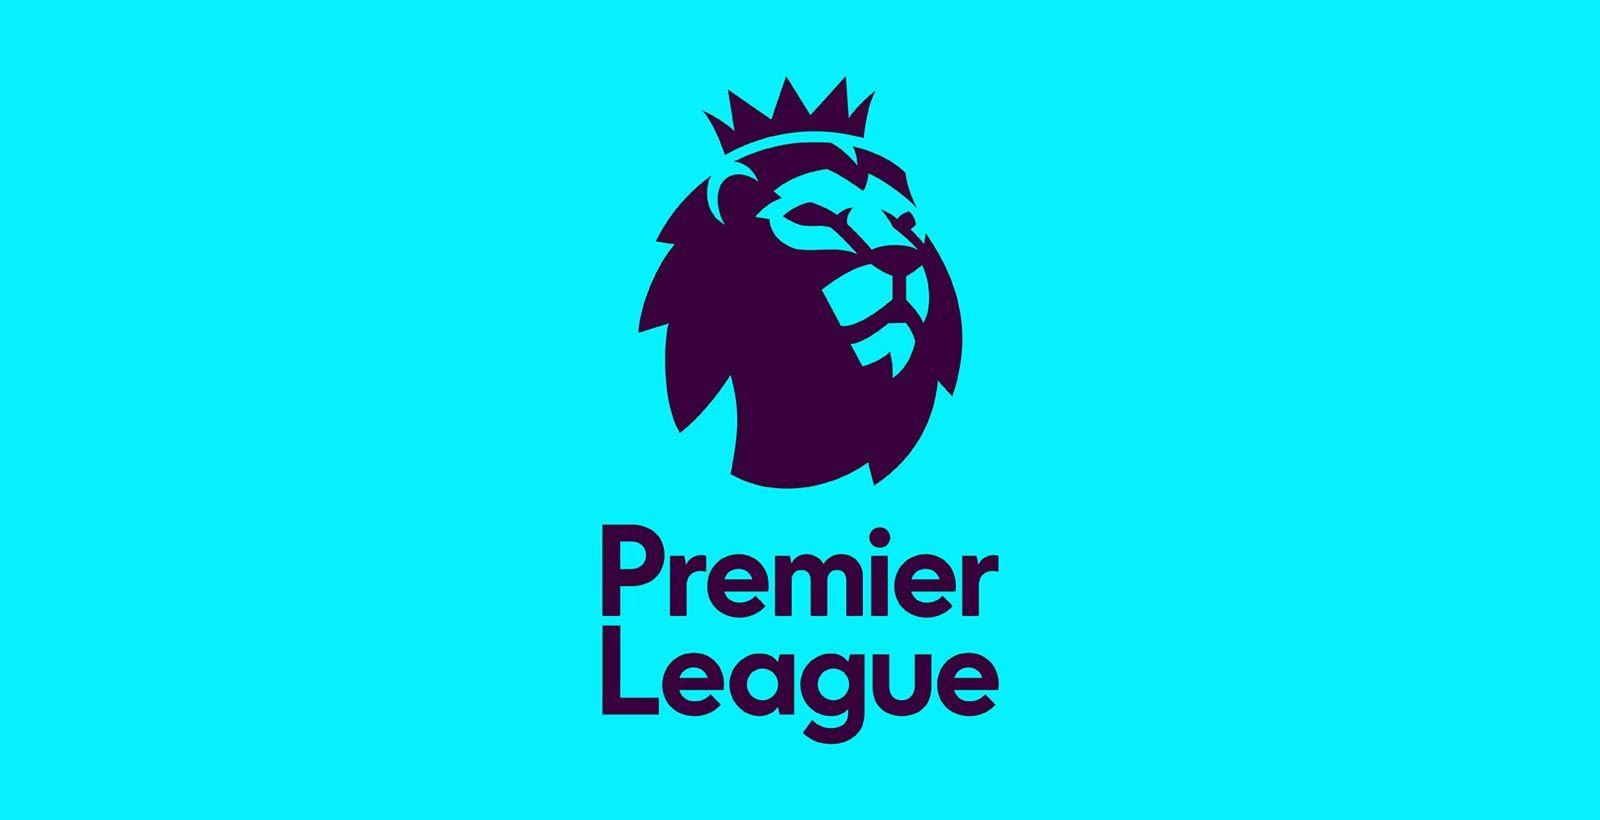 16 people at Premier League clubs test positive for coronavirus